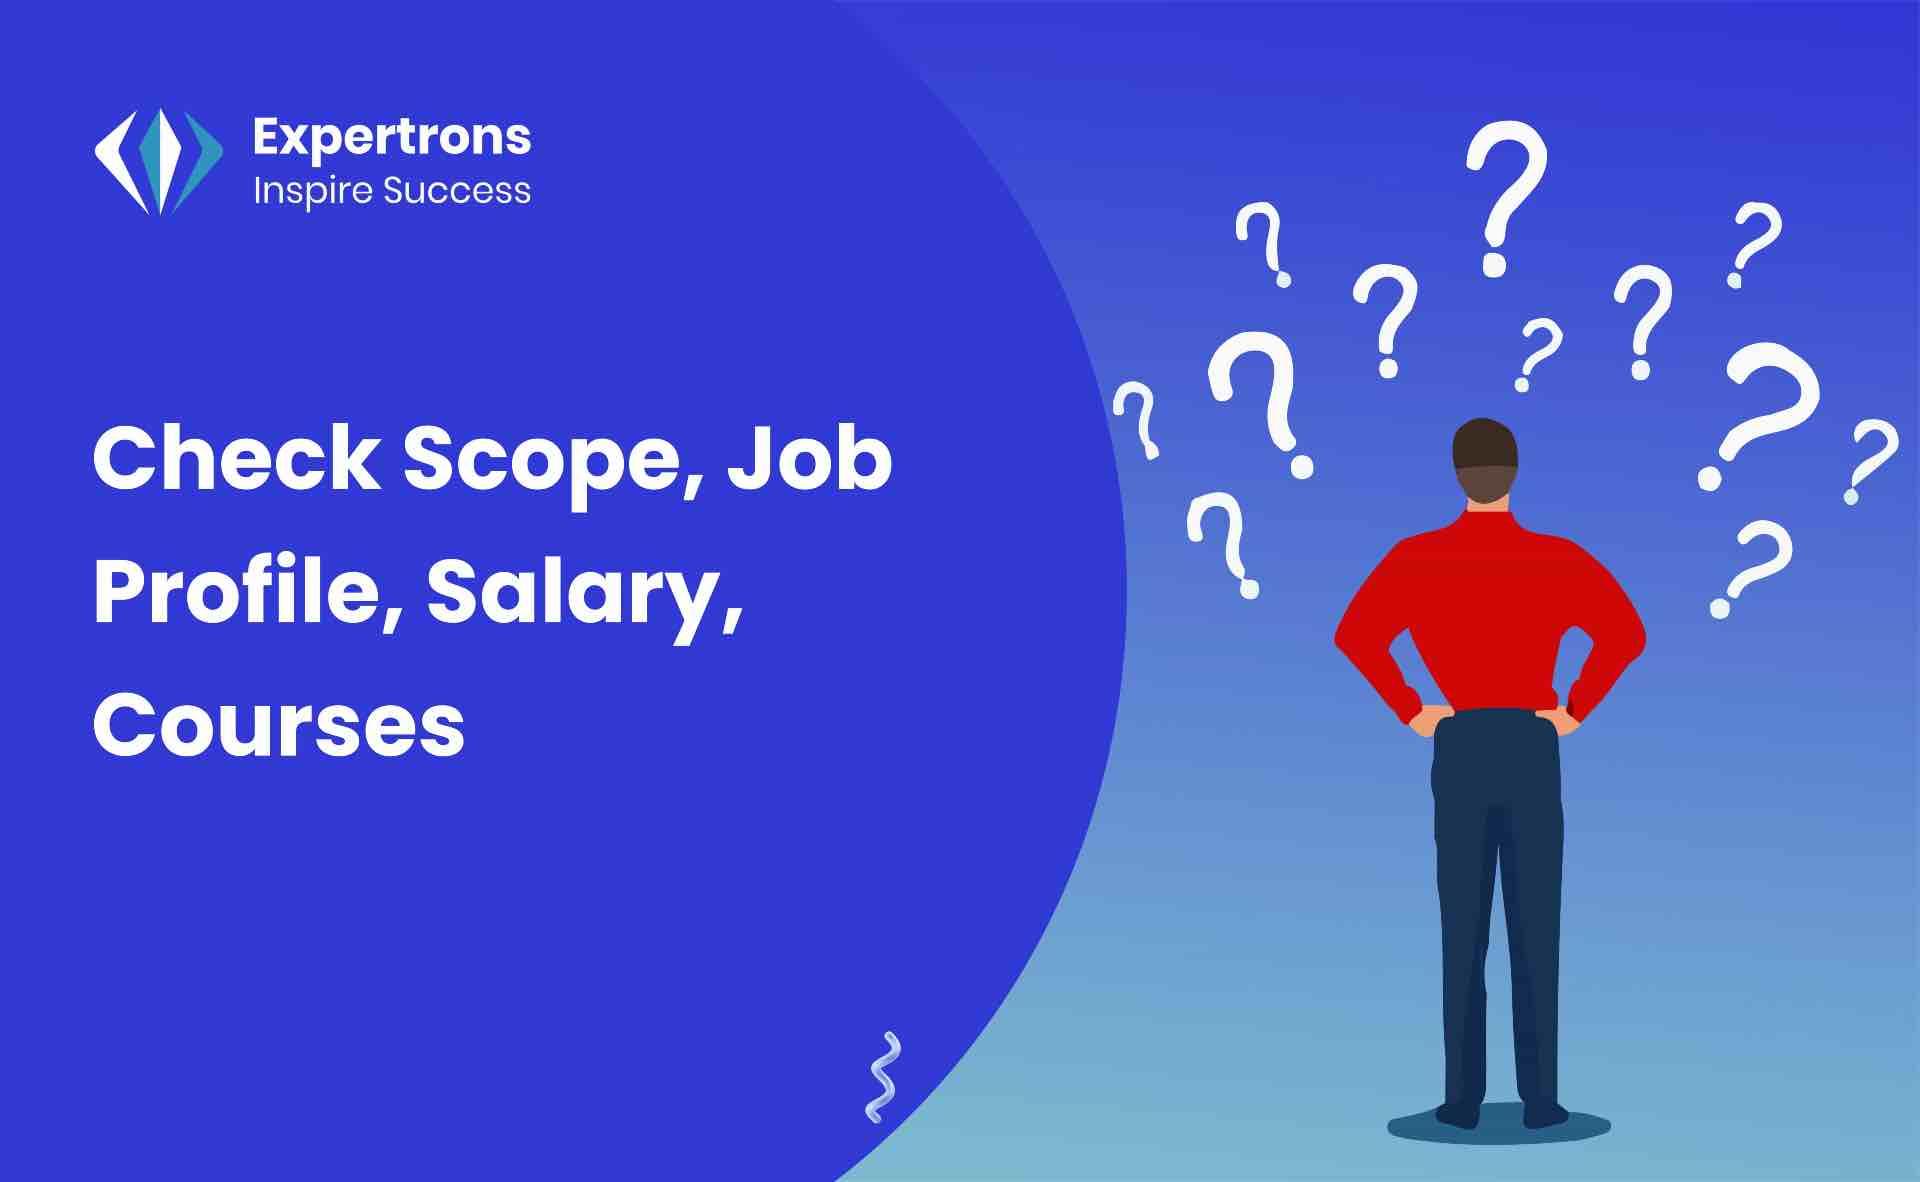 Career Guidance, Career Guidance Experts, Career Options after B.Com Company Culture Expert guidance , interview hacks, interviews, dream job, B.Com graduate, B.Com degree